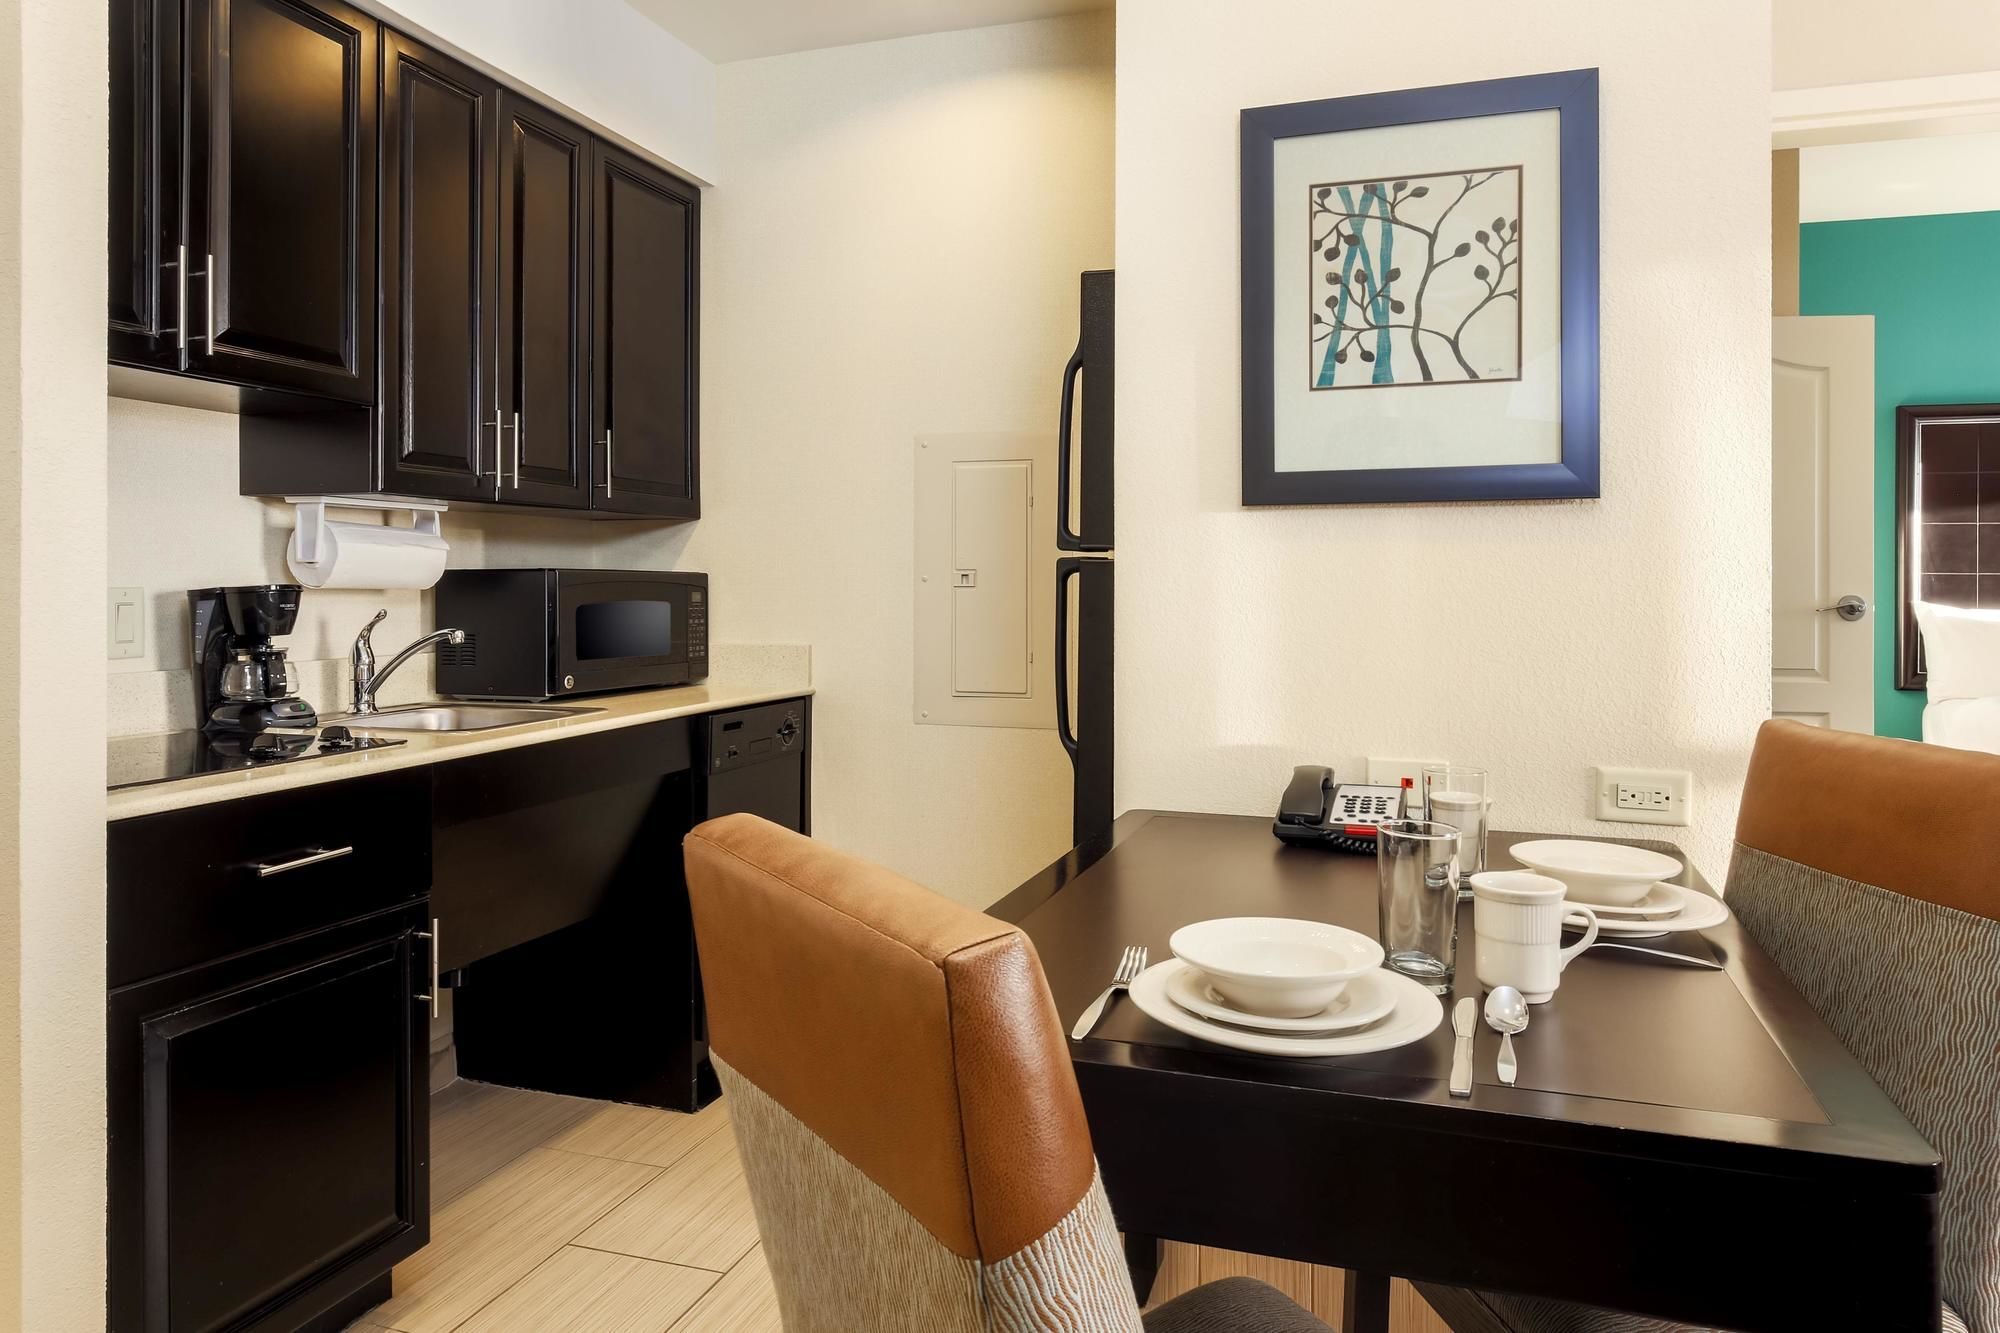 Homewood Suites By Hilton Lawton OK